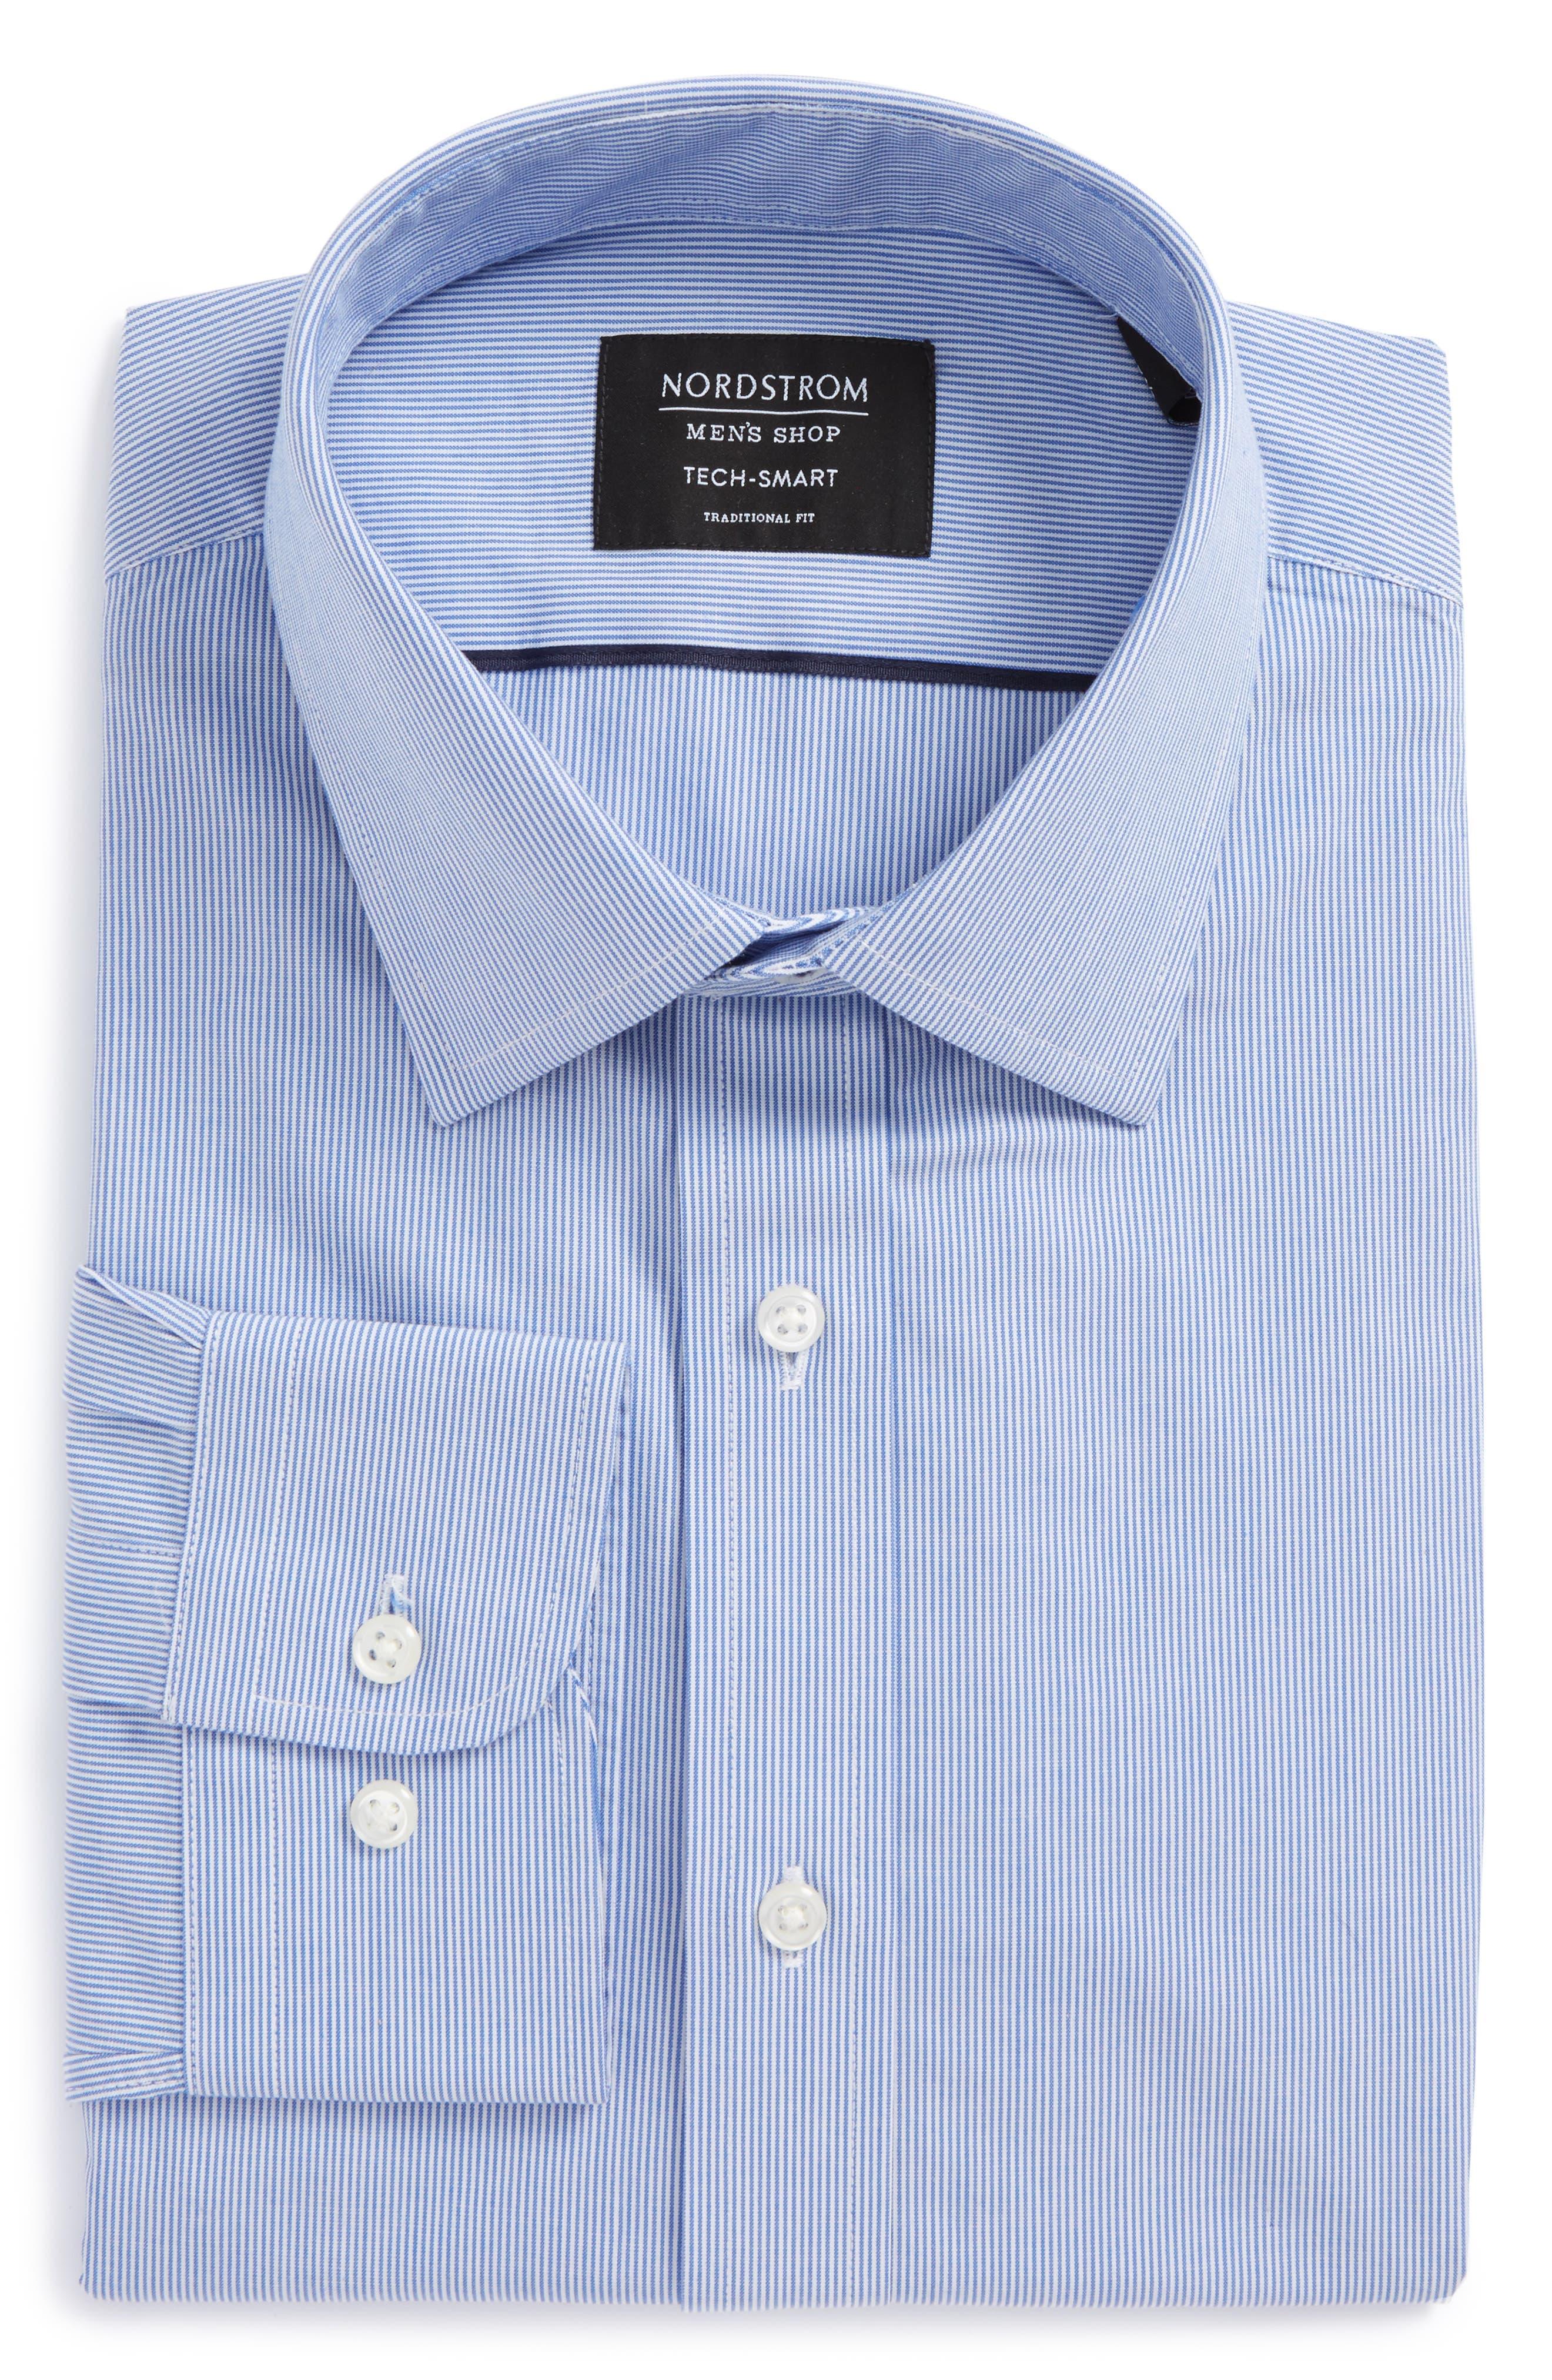 Nordstrom Men's Shop Tech-Smart Traditional Fit Stripe Dress Shirt